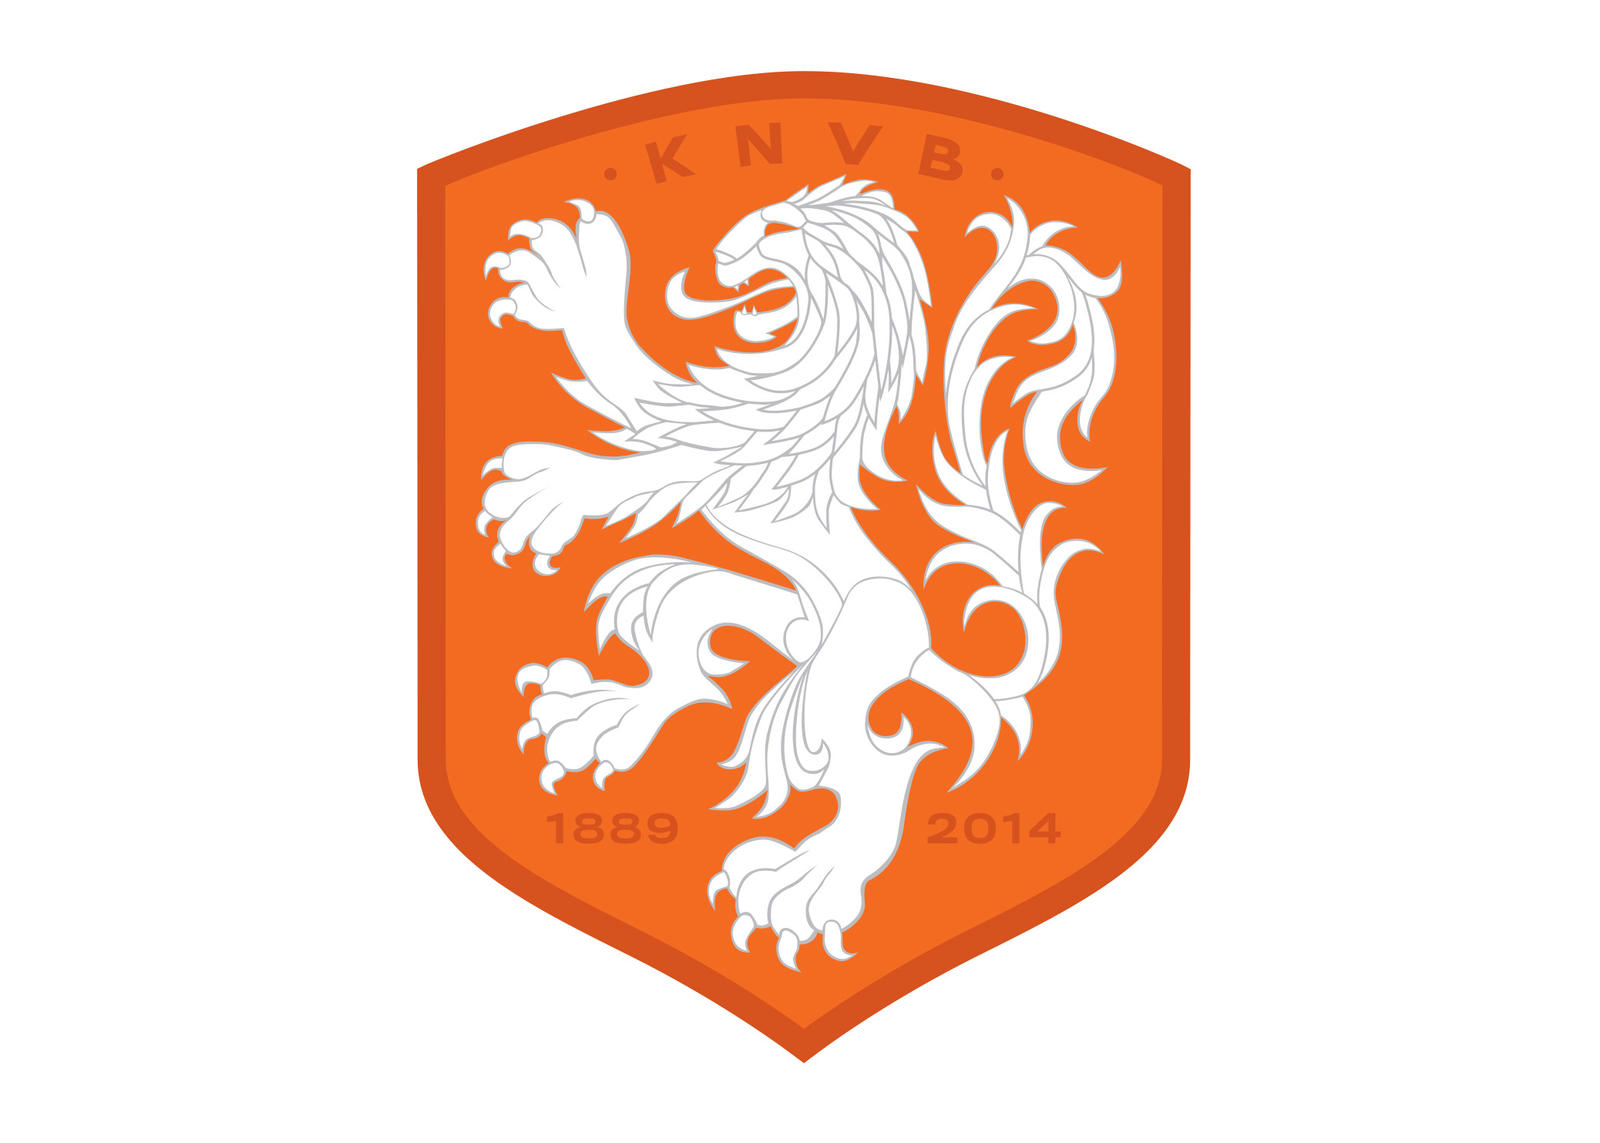 dutch national team and nike renew partnership nike news